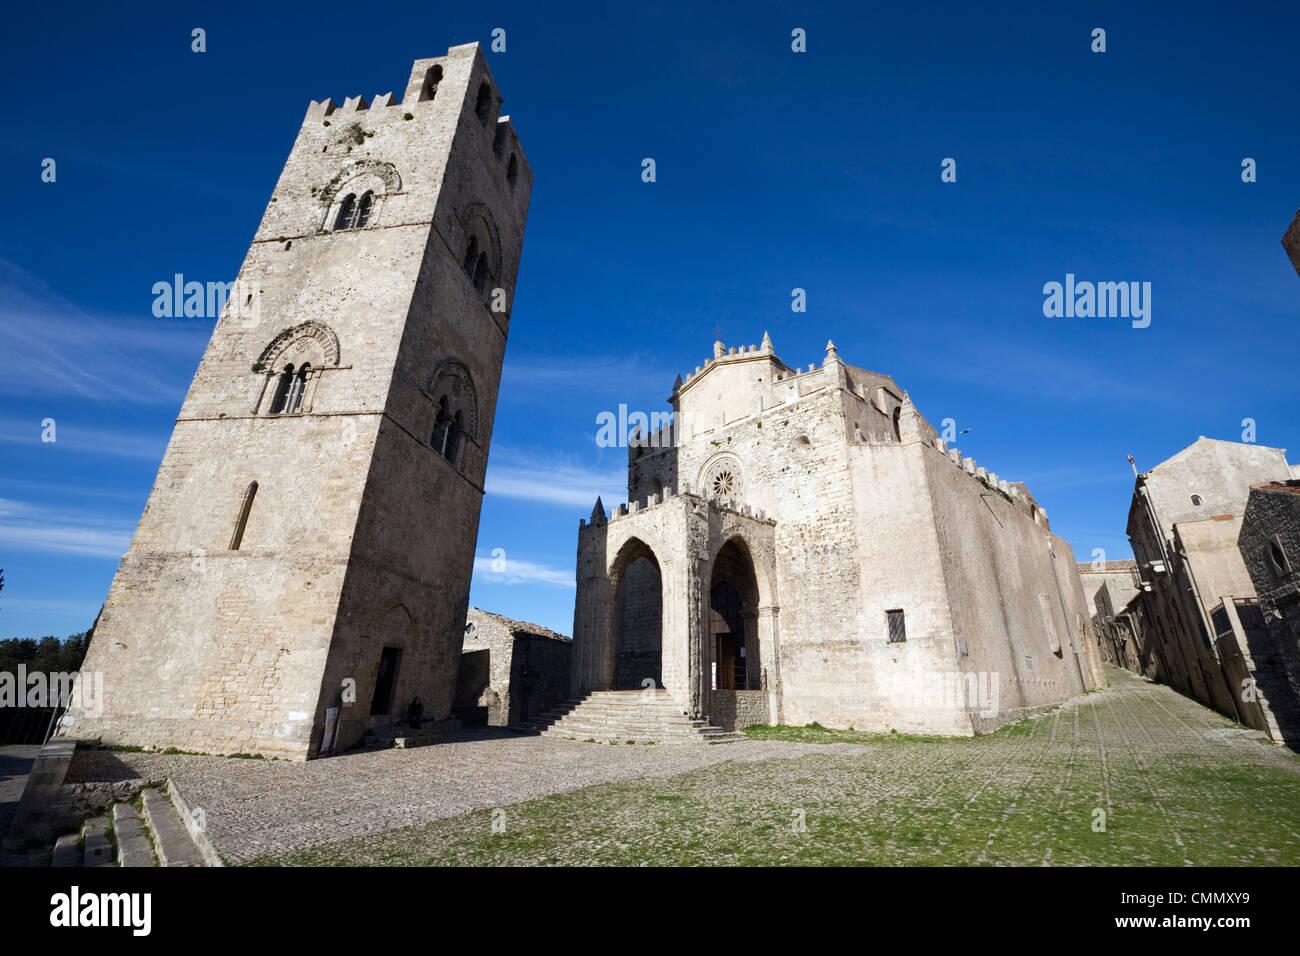 The Duomo, Erice, Sicily, Italy, Europe - Stock Image